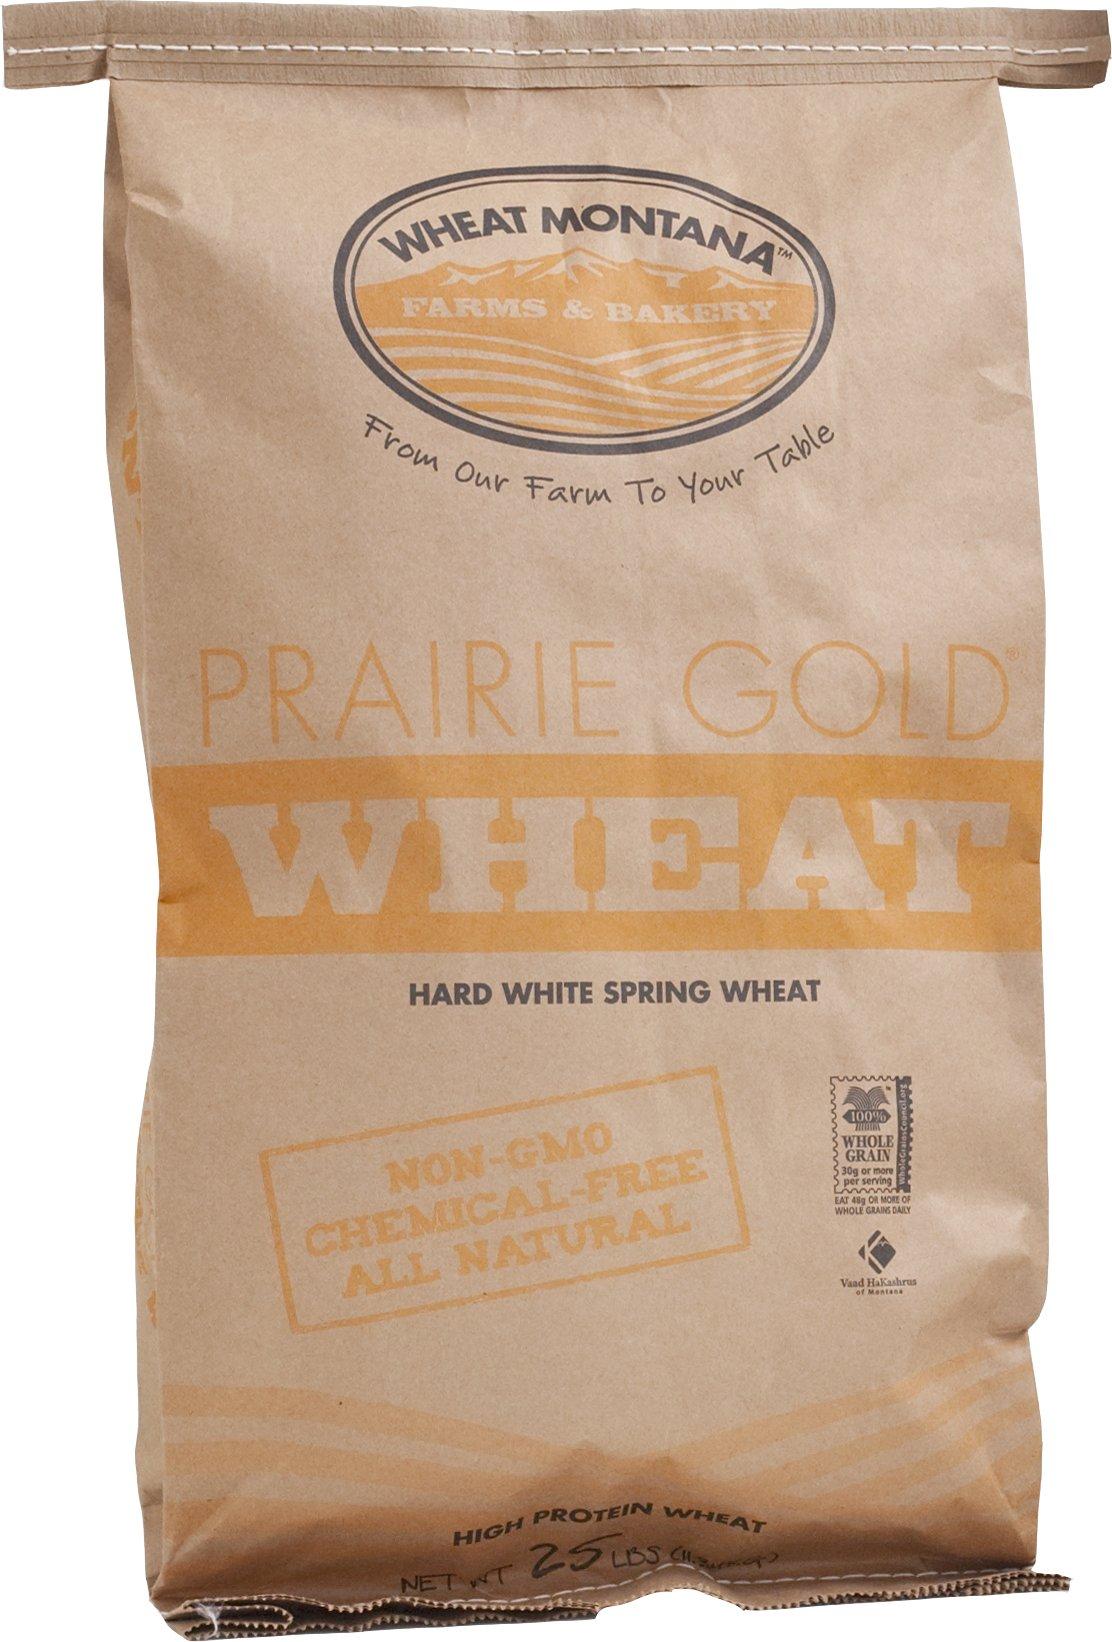 Wheat Montana Gold Wheat, Prairie, 25 Pound by Wheat Montana